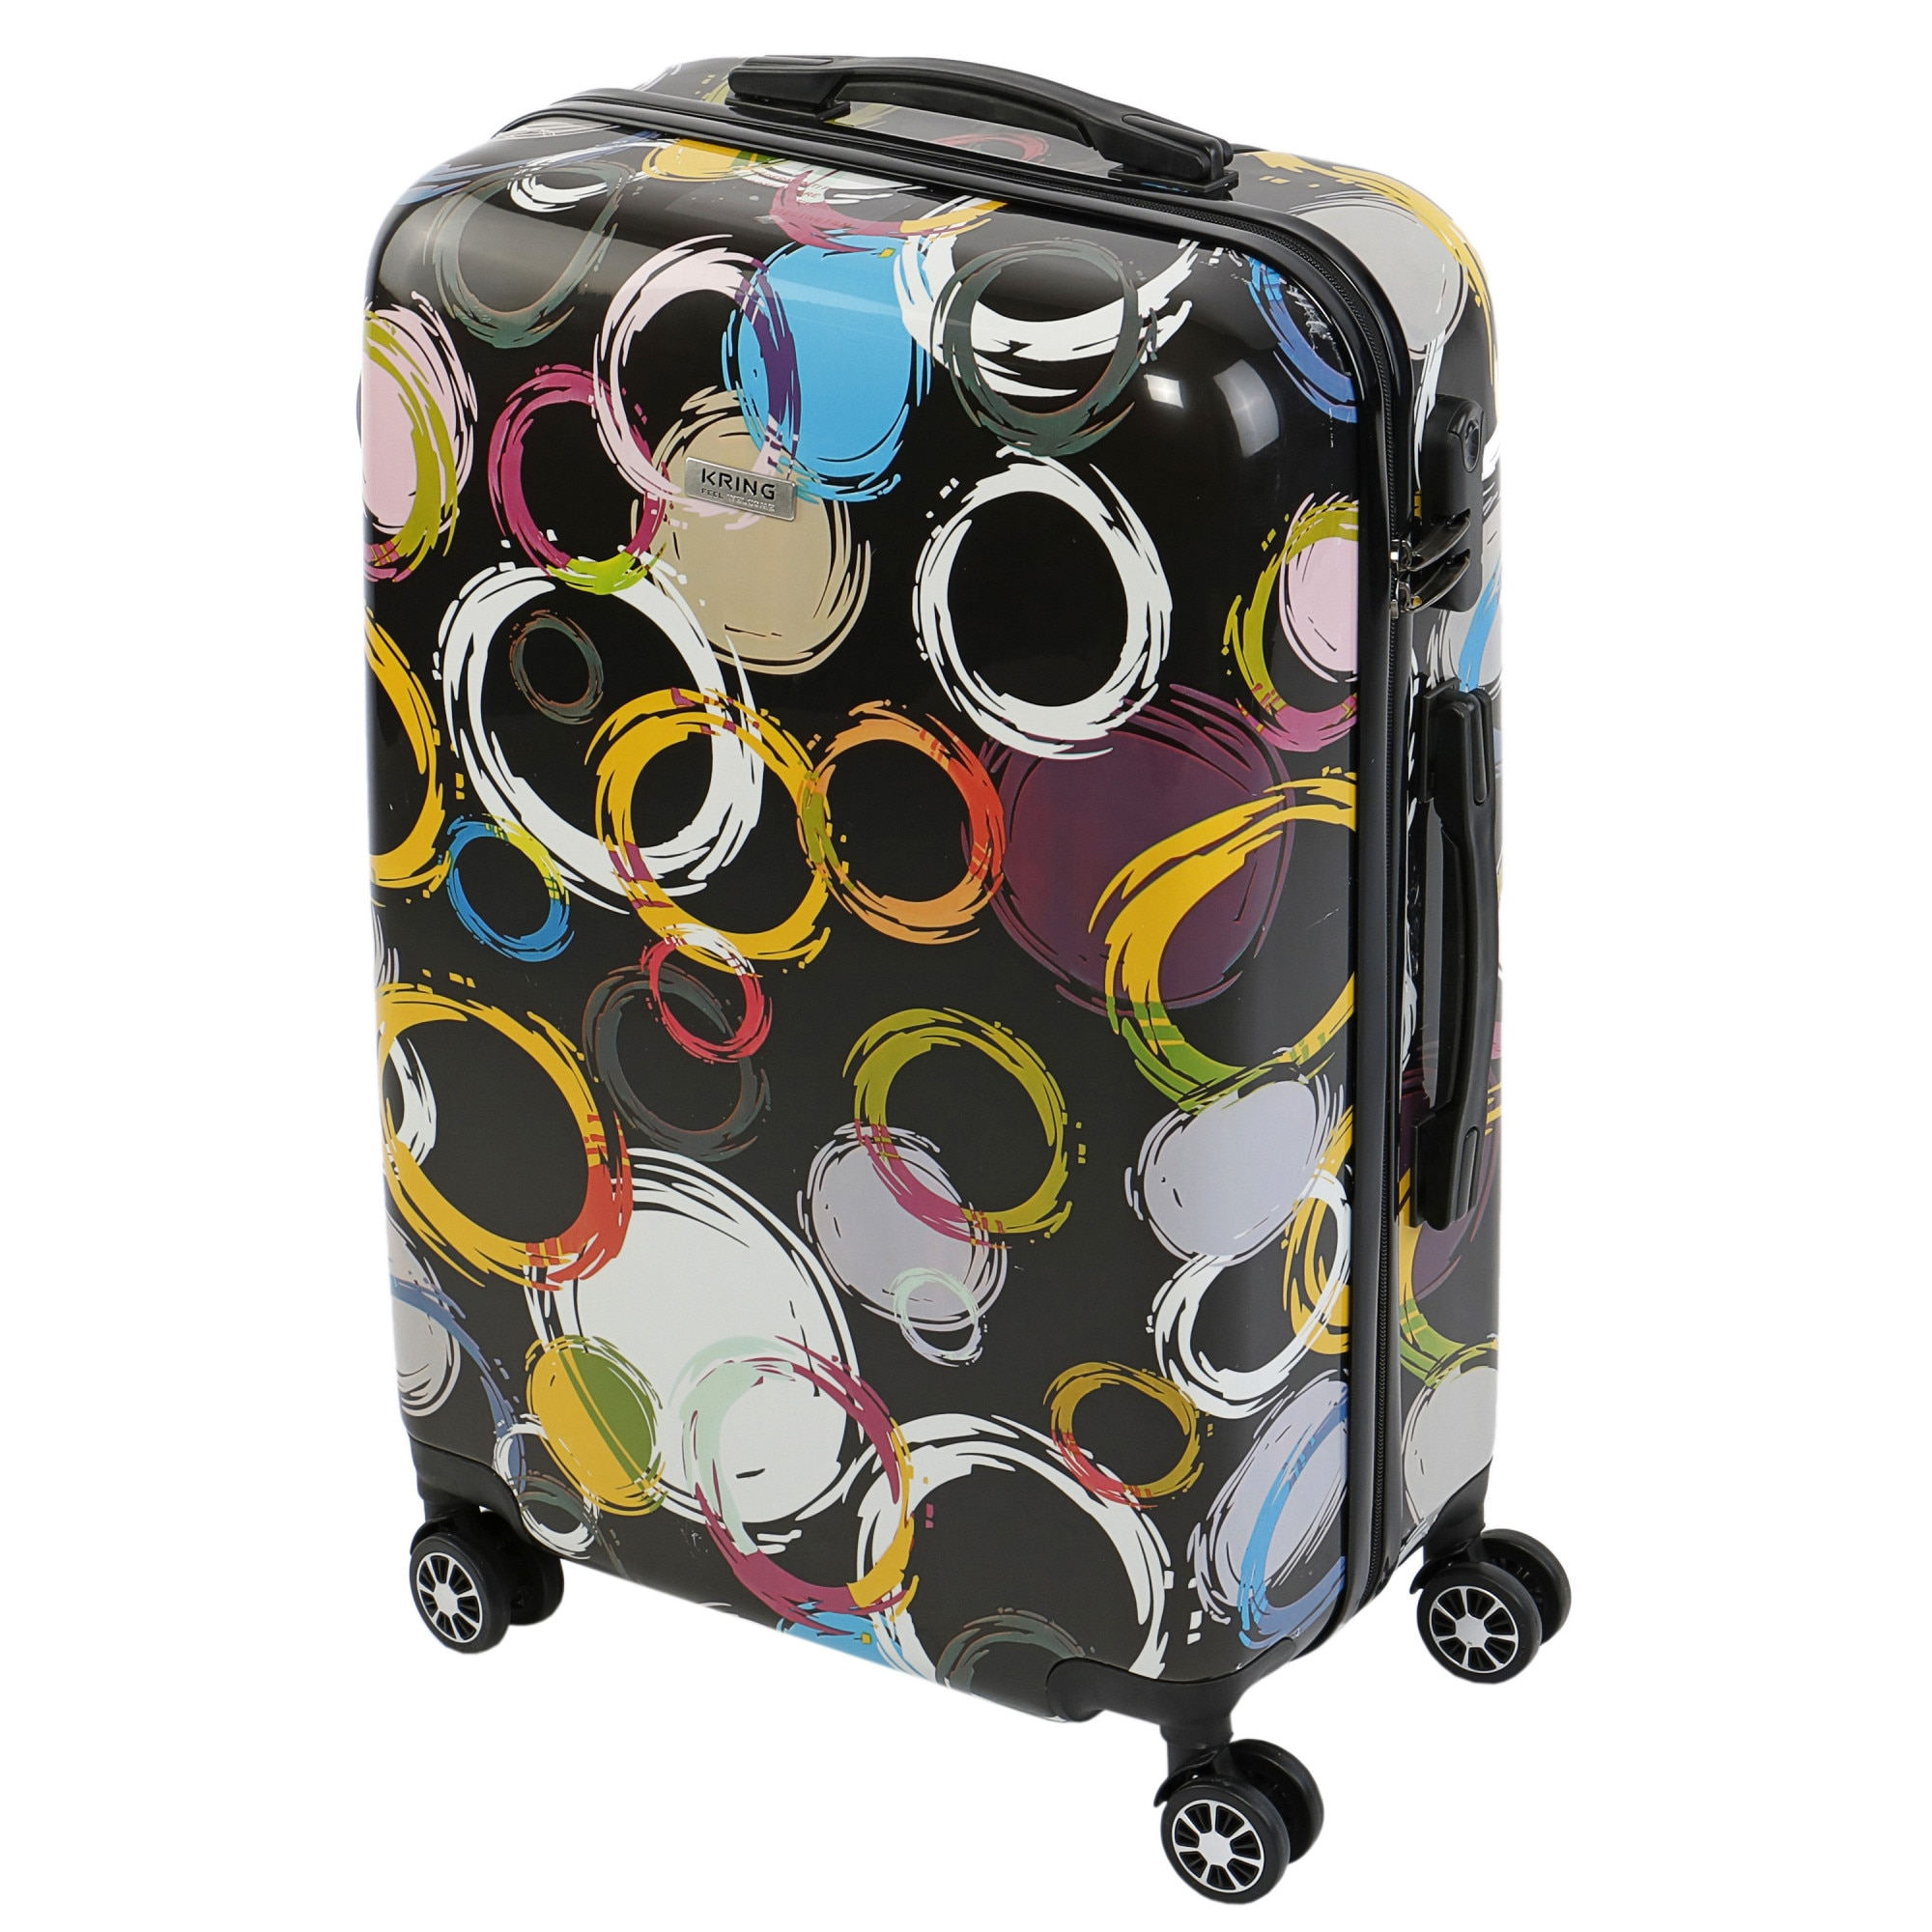 Fotografie Troler KRING Circles, ABS+PC, 75 cm, Multicolor